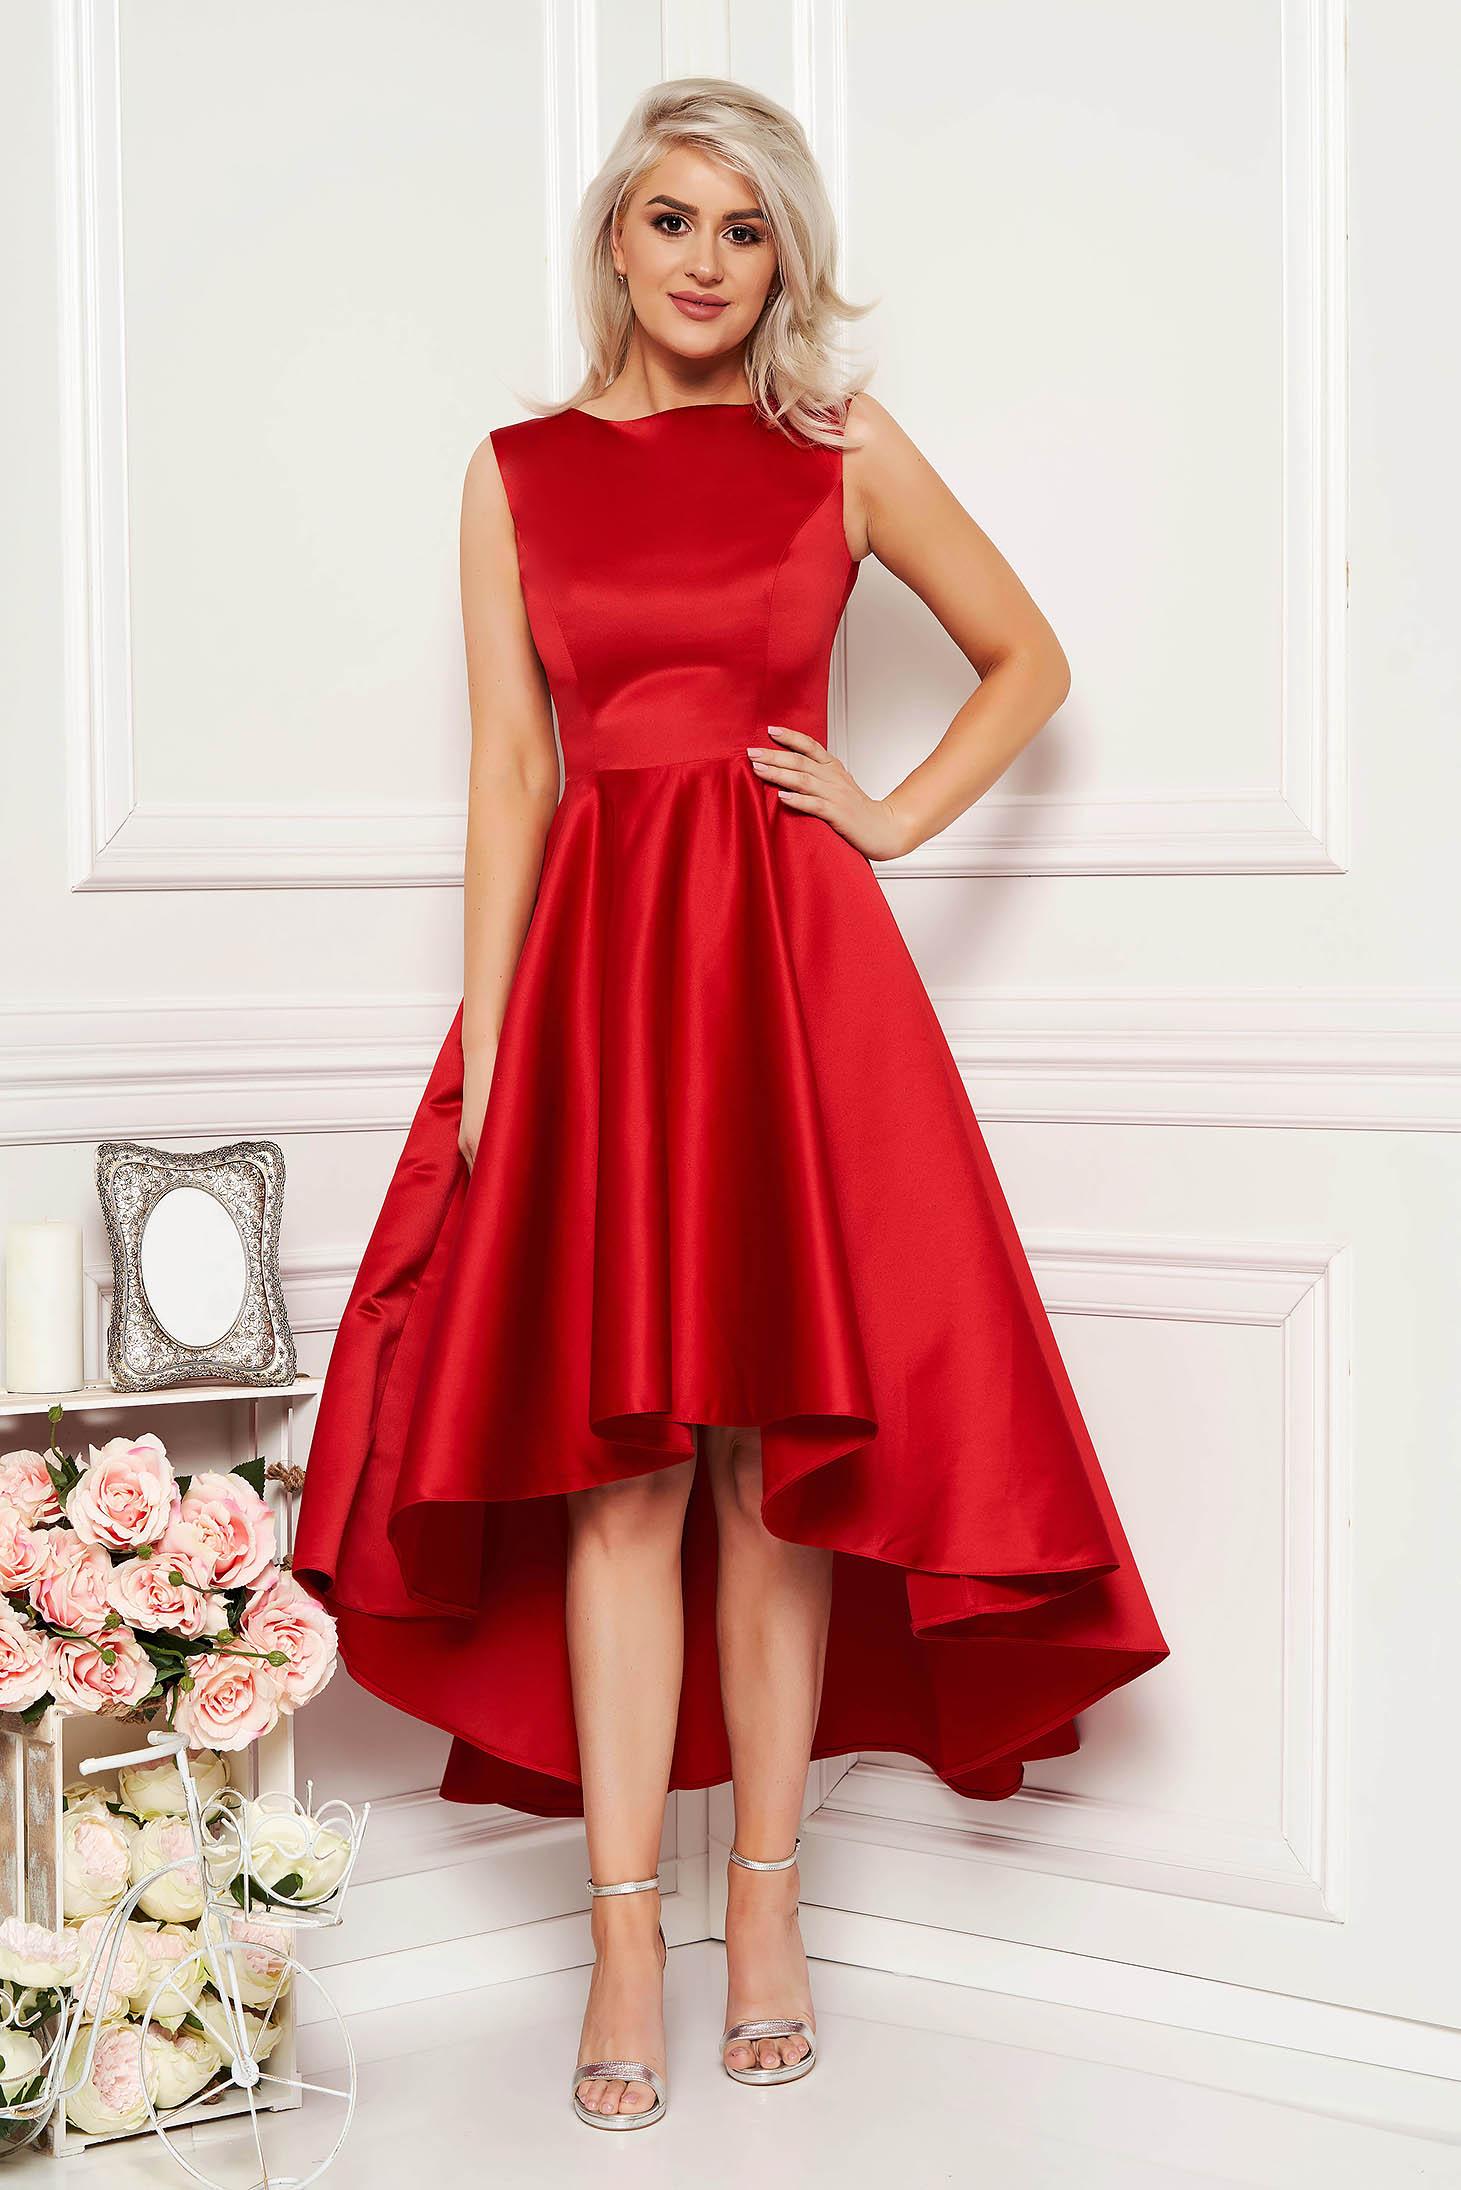 Rochie rosie eleganta asimetrica de ocazie in clos din material satinat fara maneci